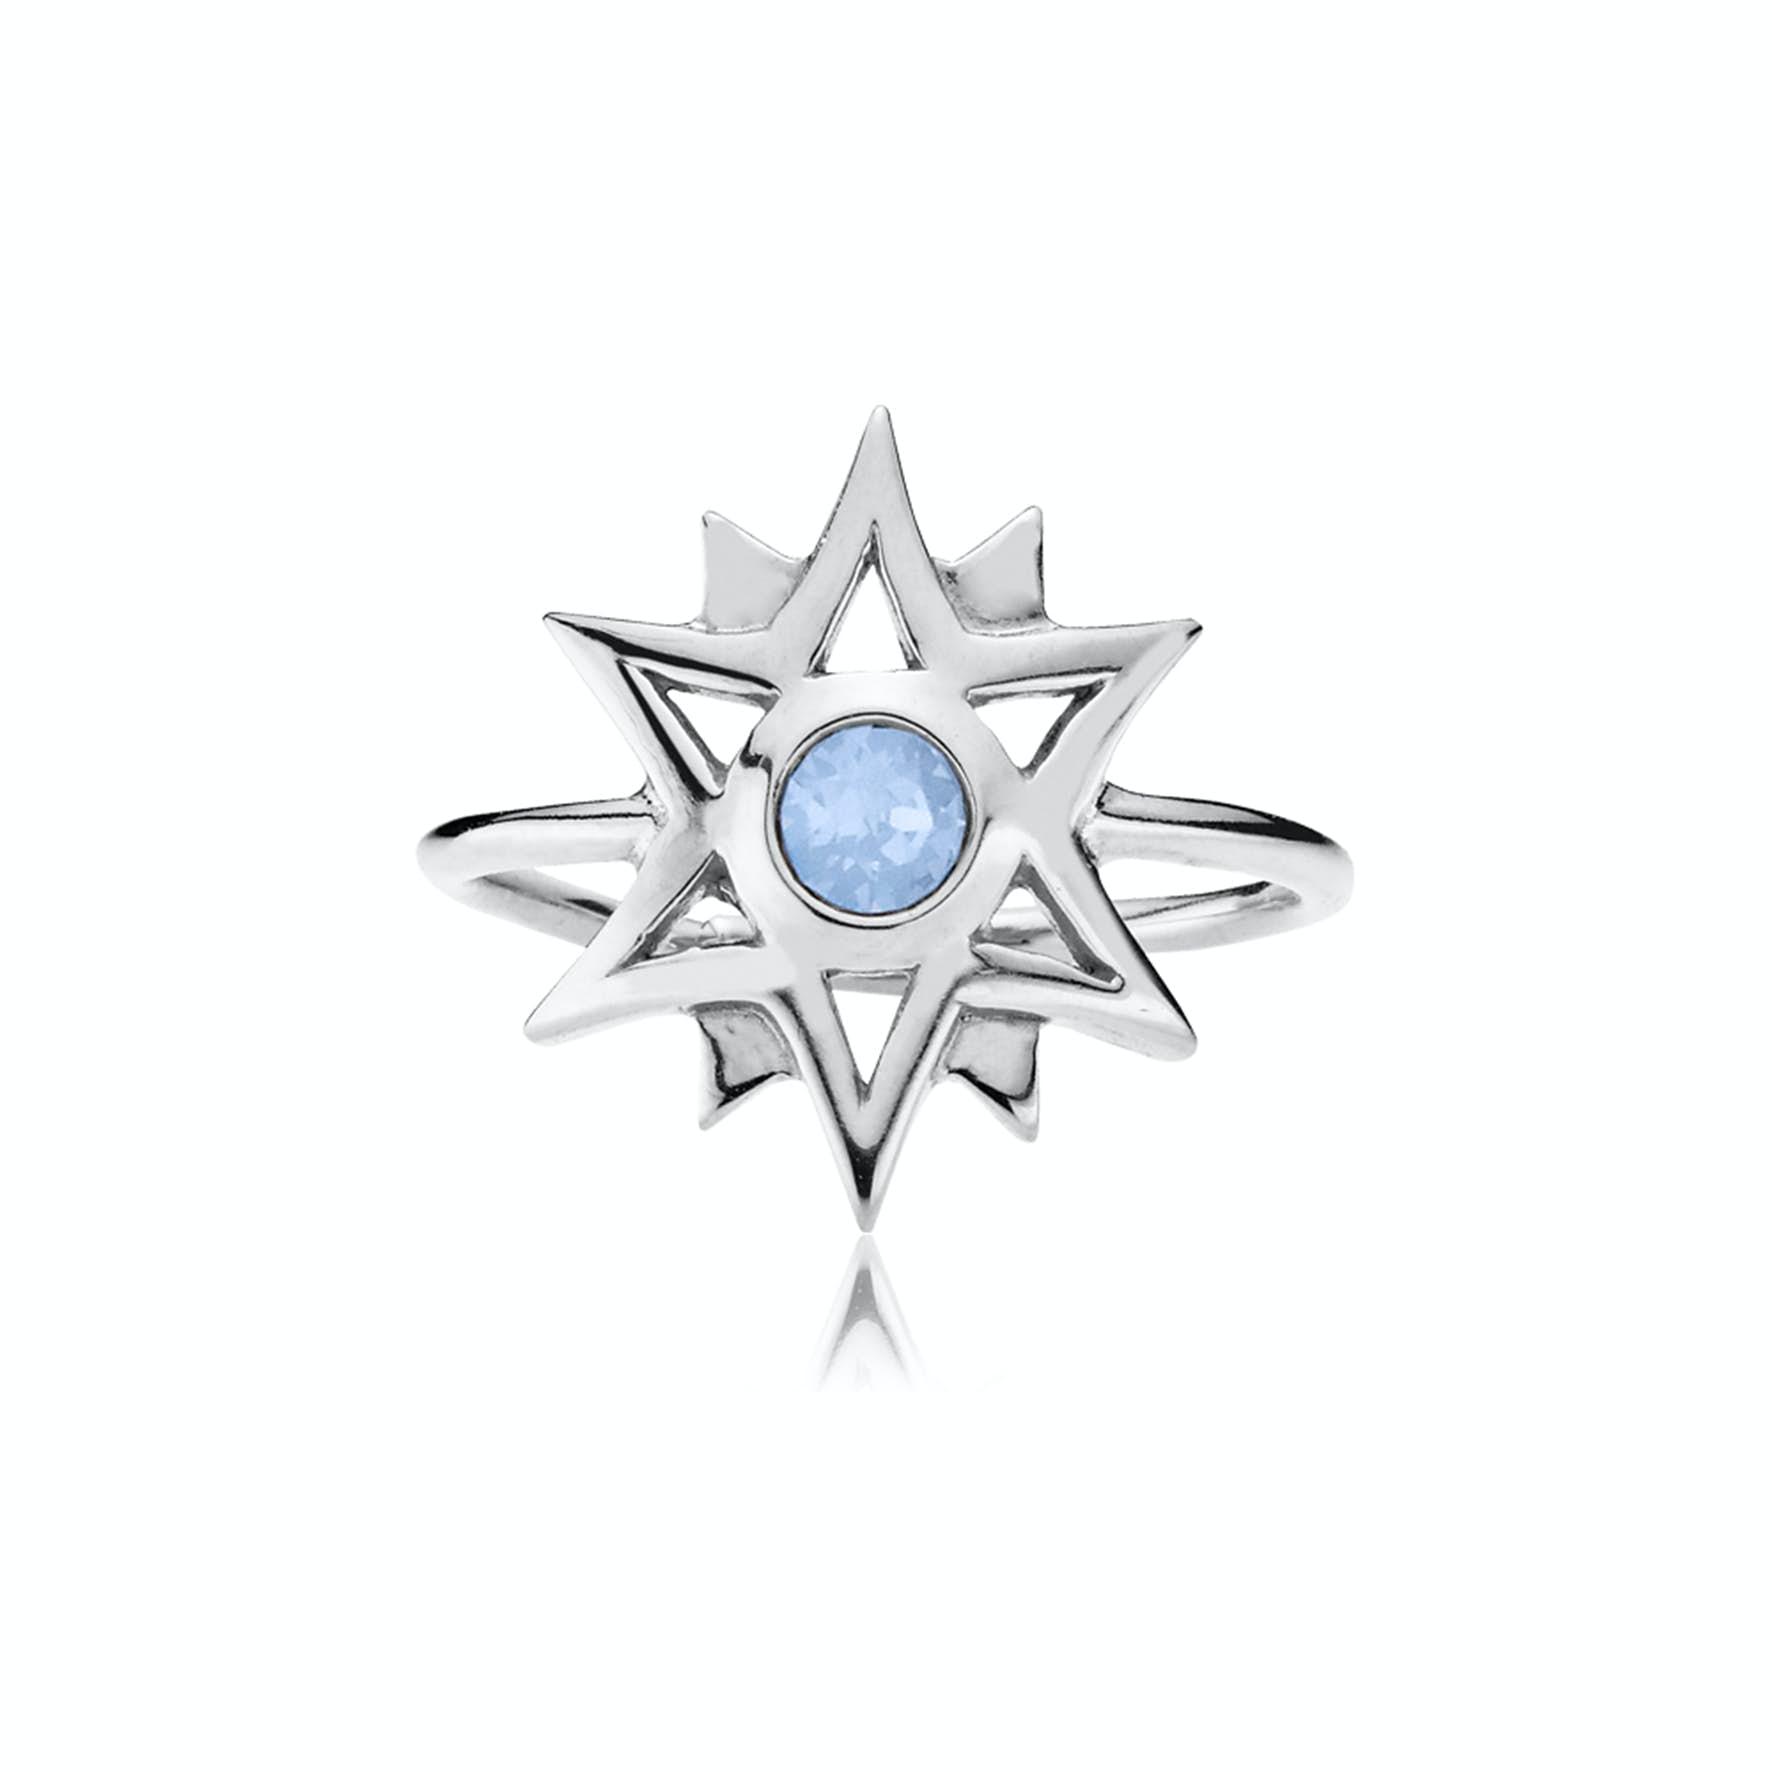 Olivia by Sistie Ring von Sistie in Silber Sterling 925